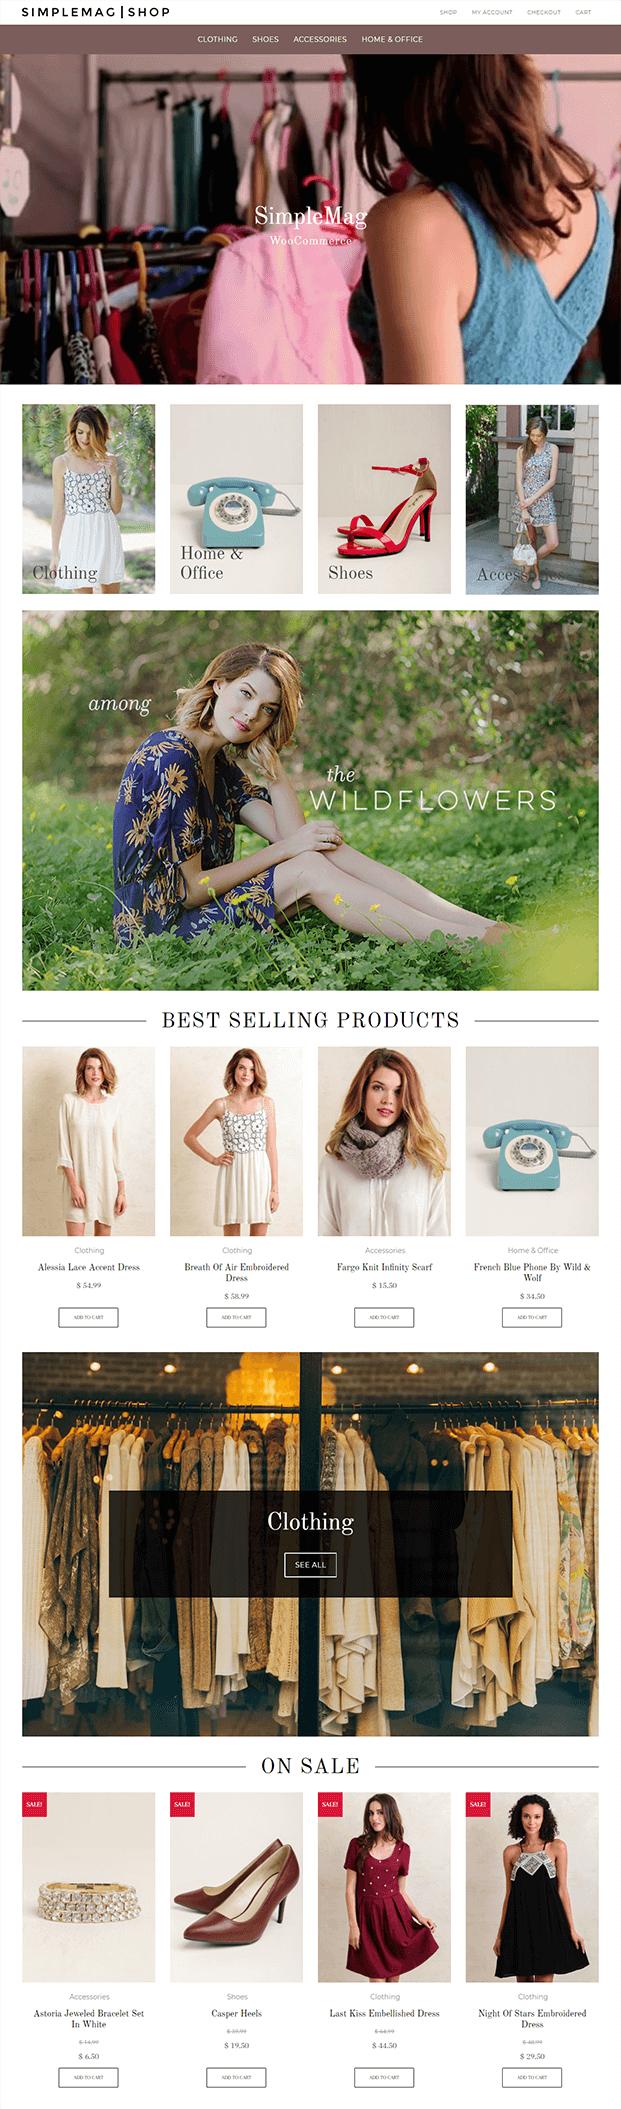 SimpleMag Shop - WordPress Online Magazine Theme